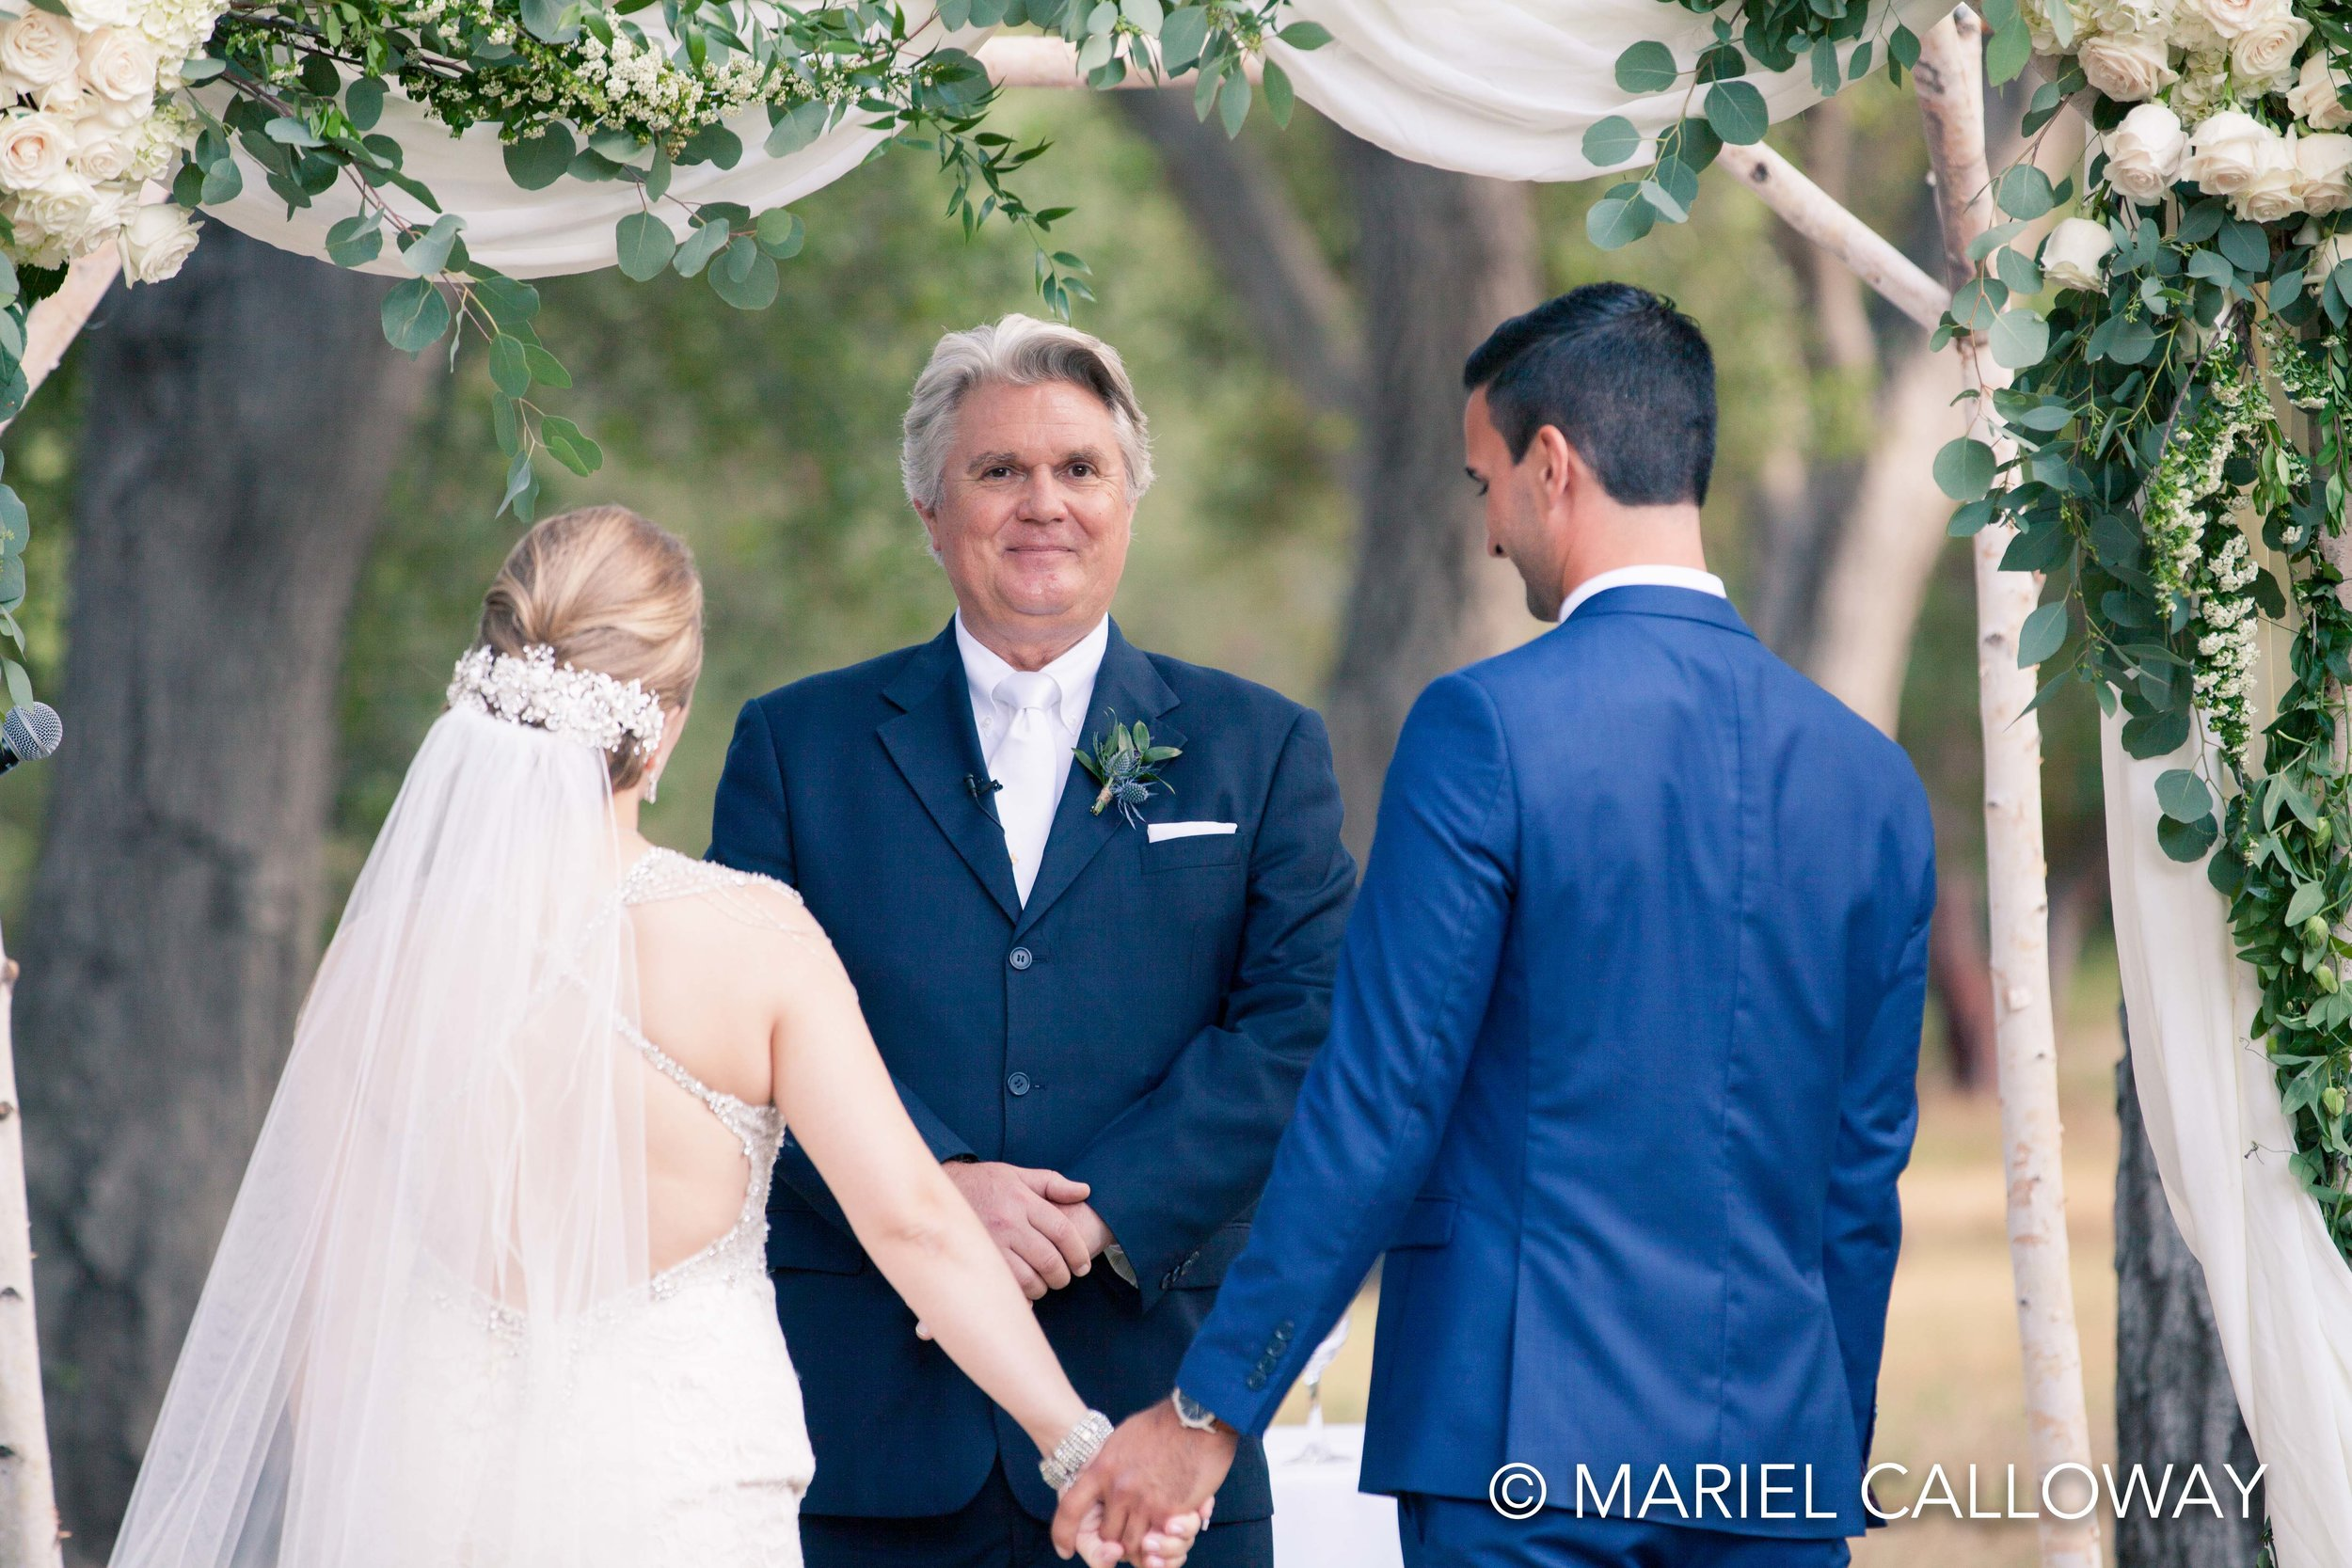 Mariel-Calloway-Los-Angeles-Wedding-Photography-Smith-23.jpg